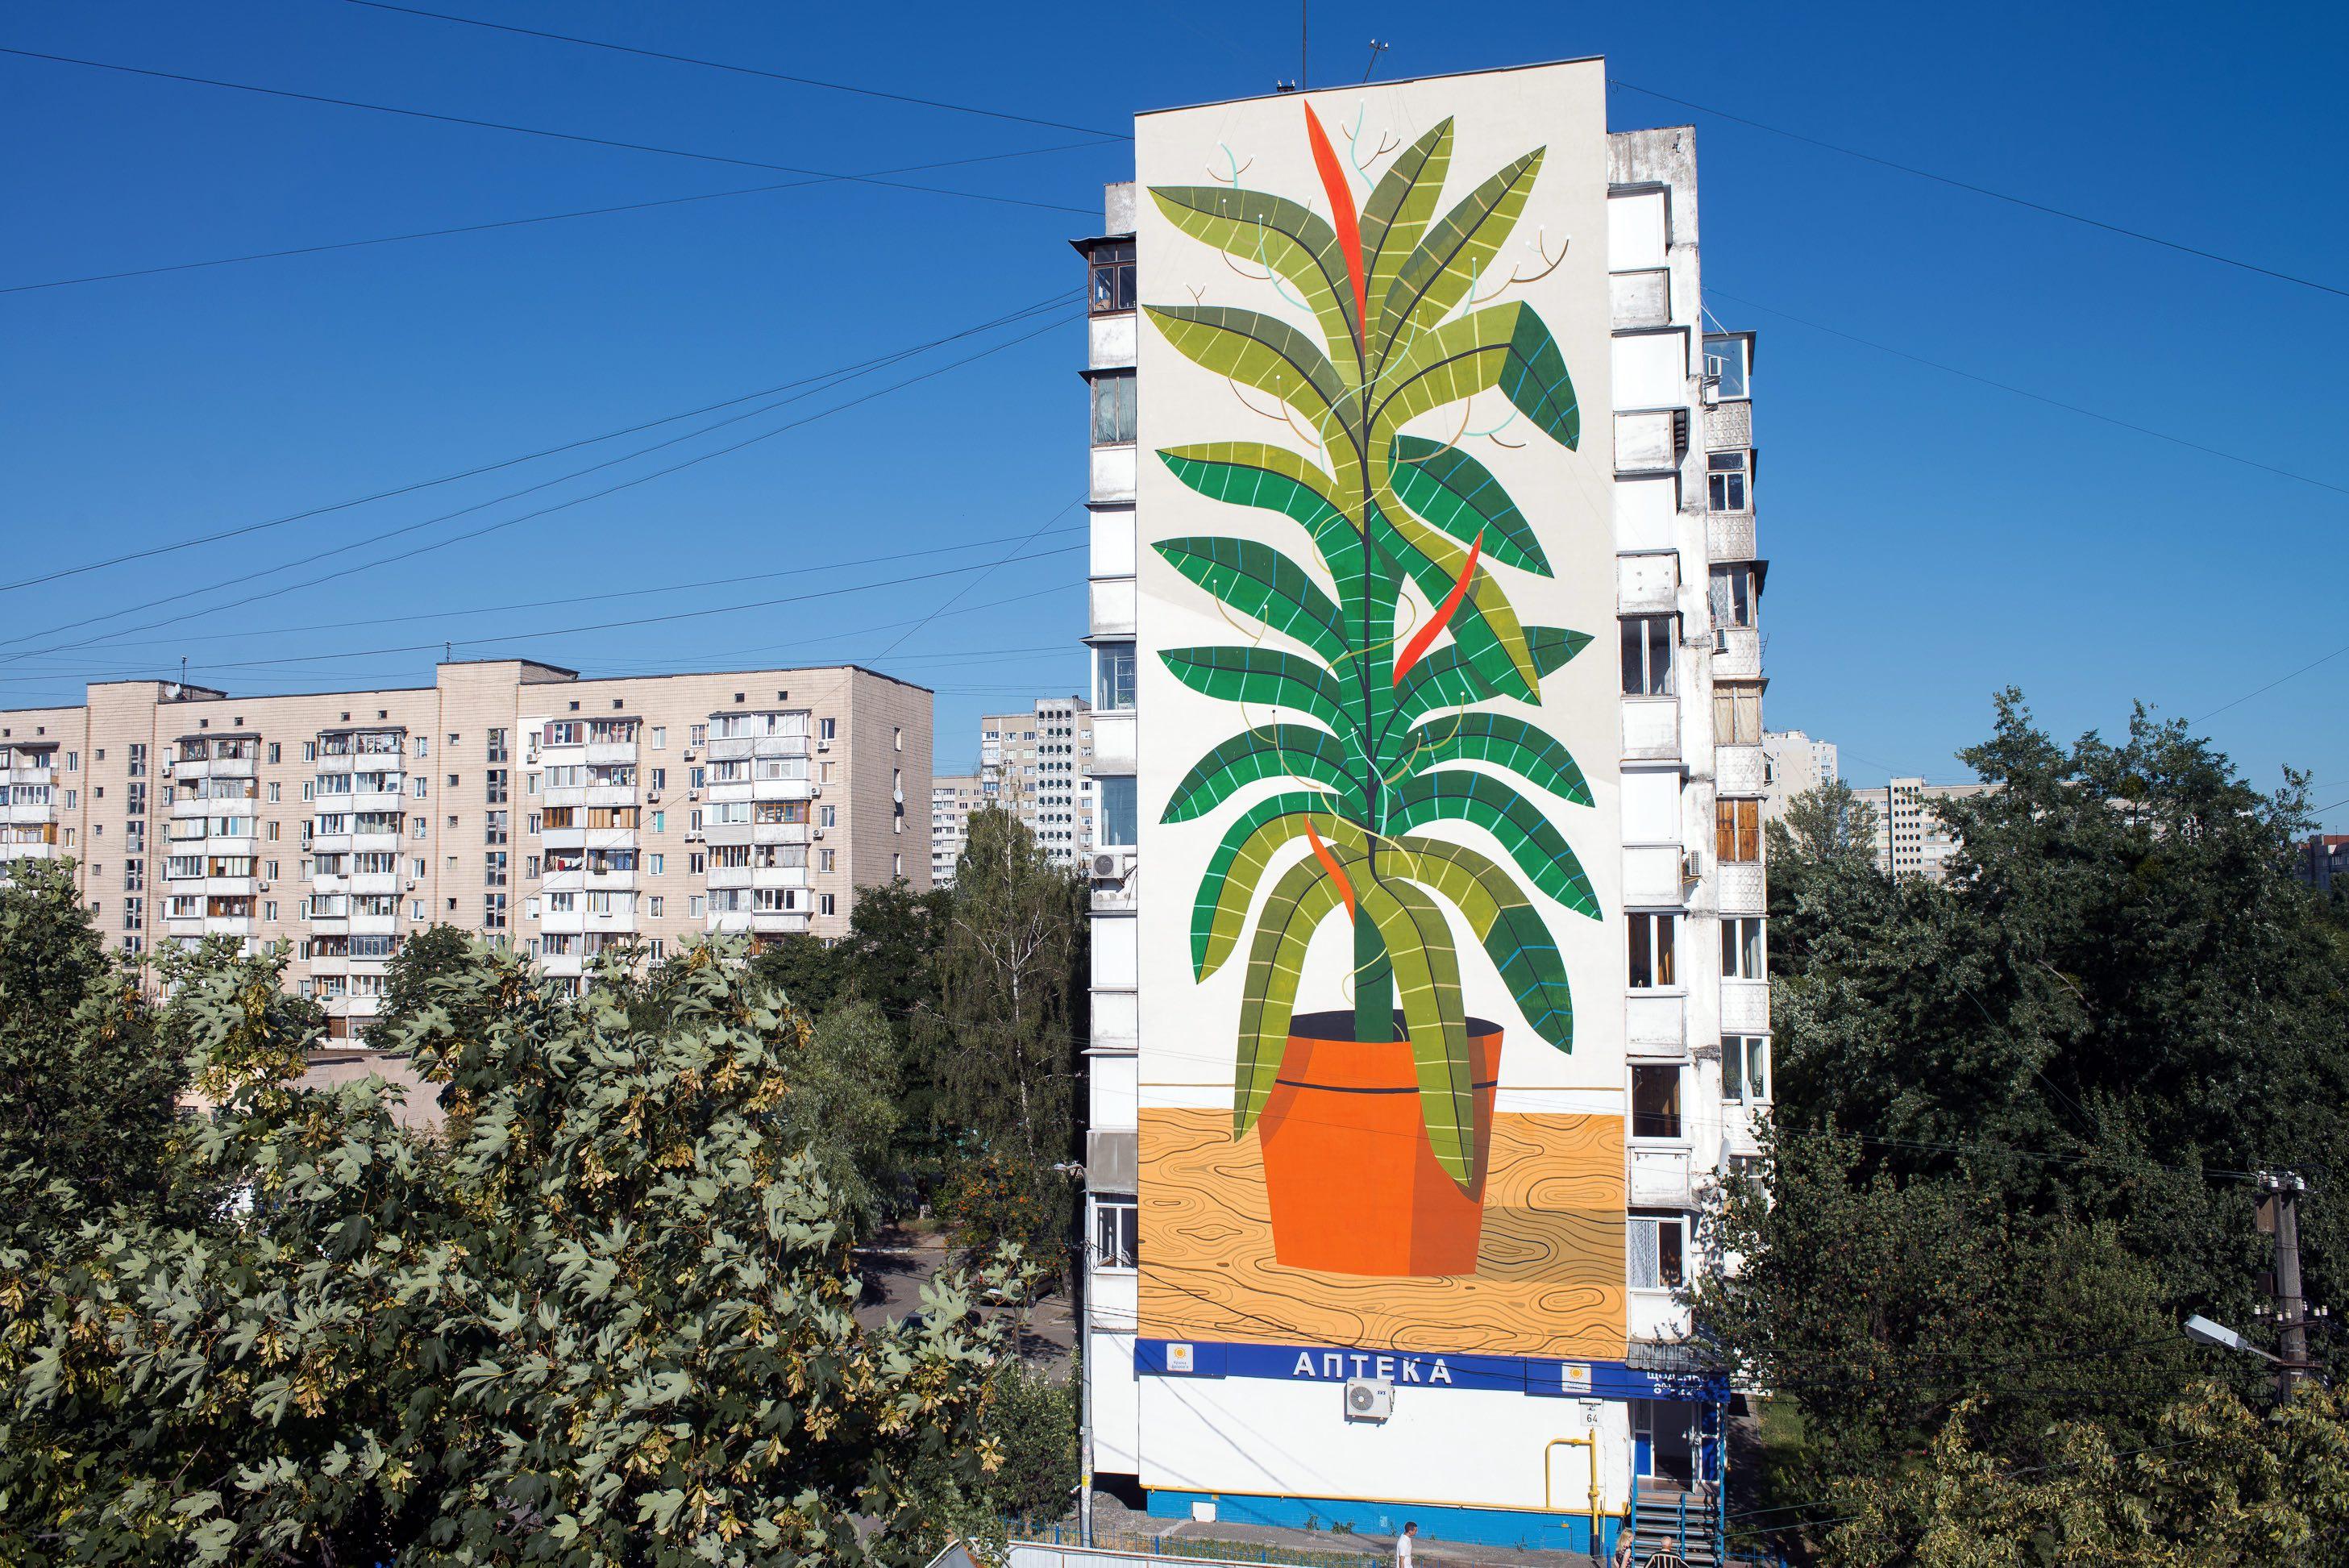 Agostino Iacurci прикрасив дев'ятиповерхівку Києва своїм муралом  - фото 1